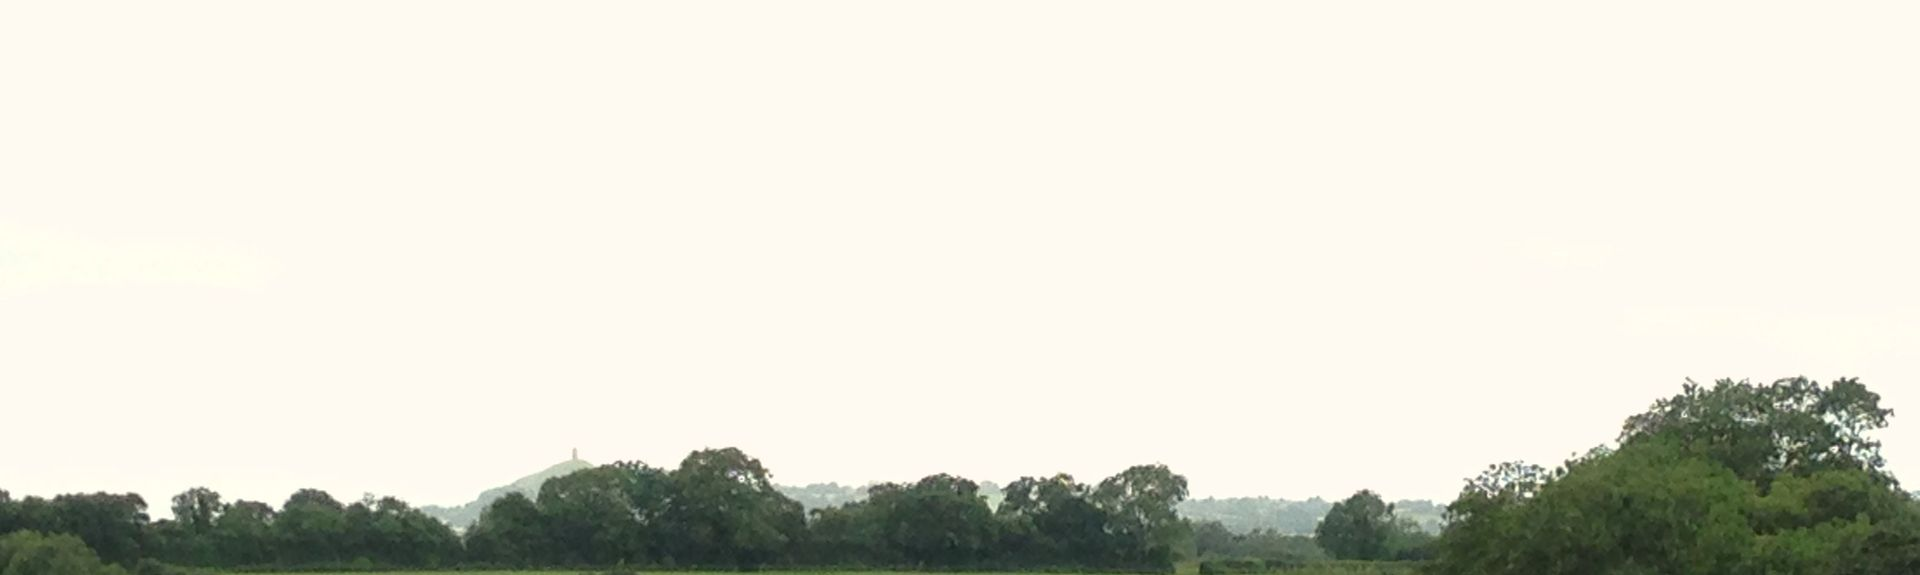 Yeovil, England, Storbritannia